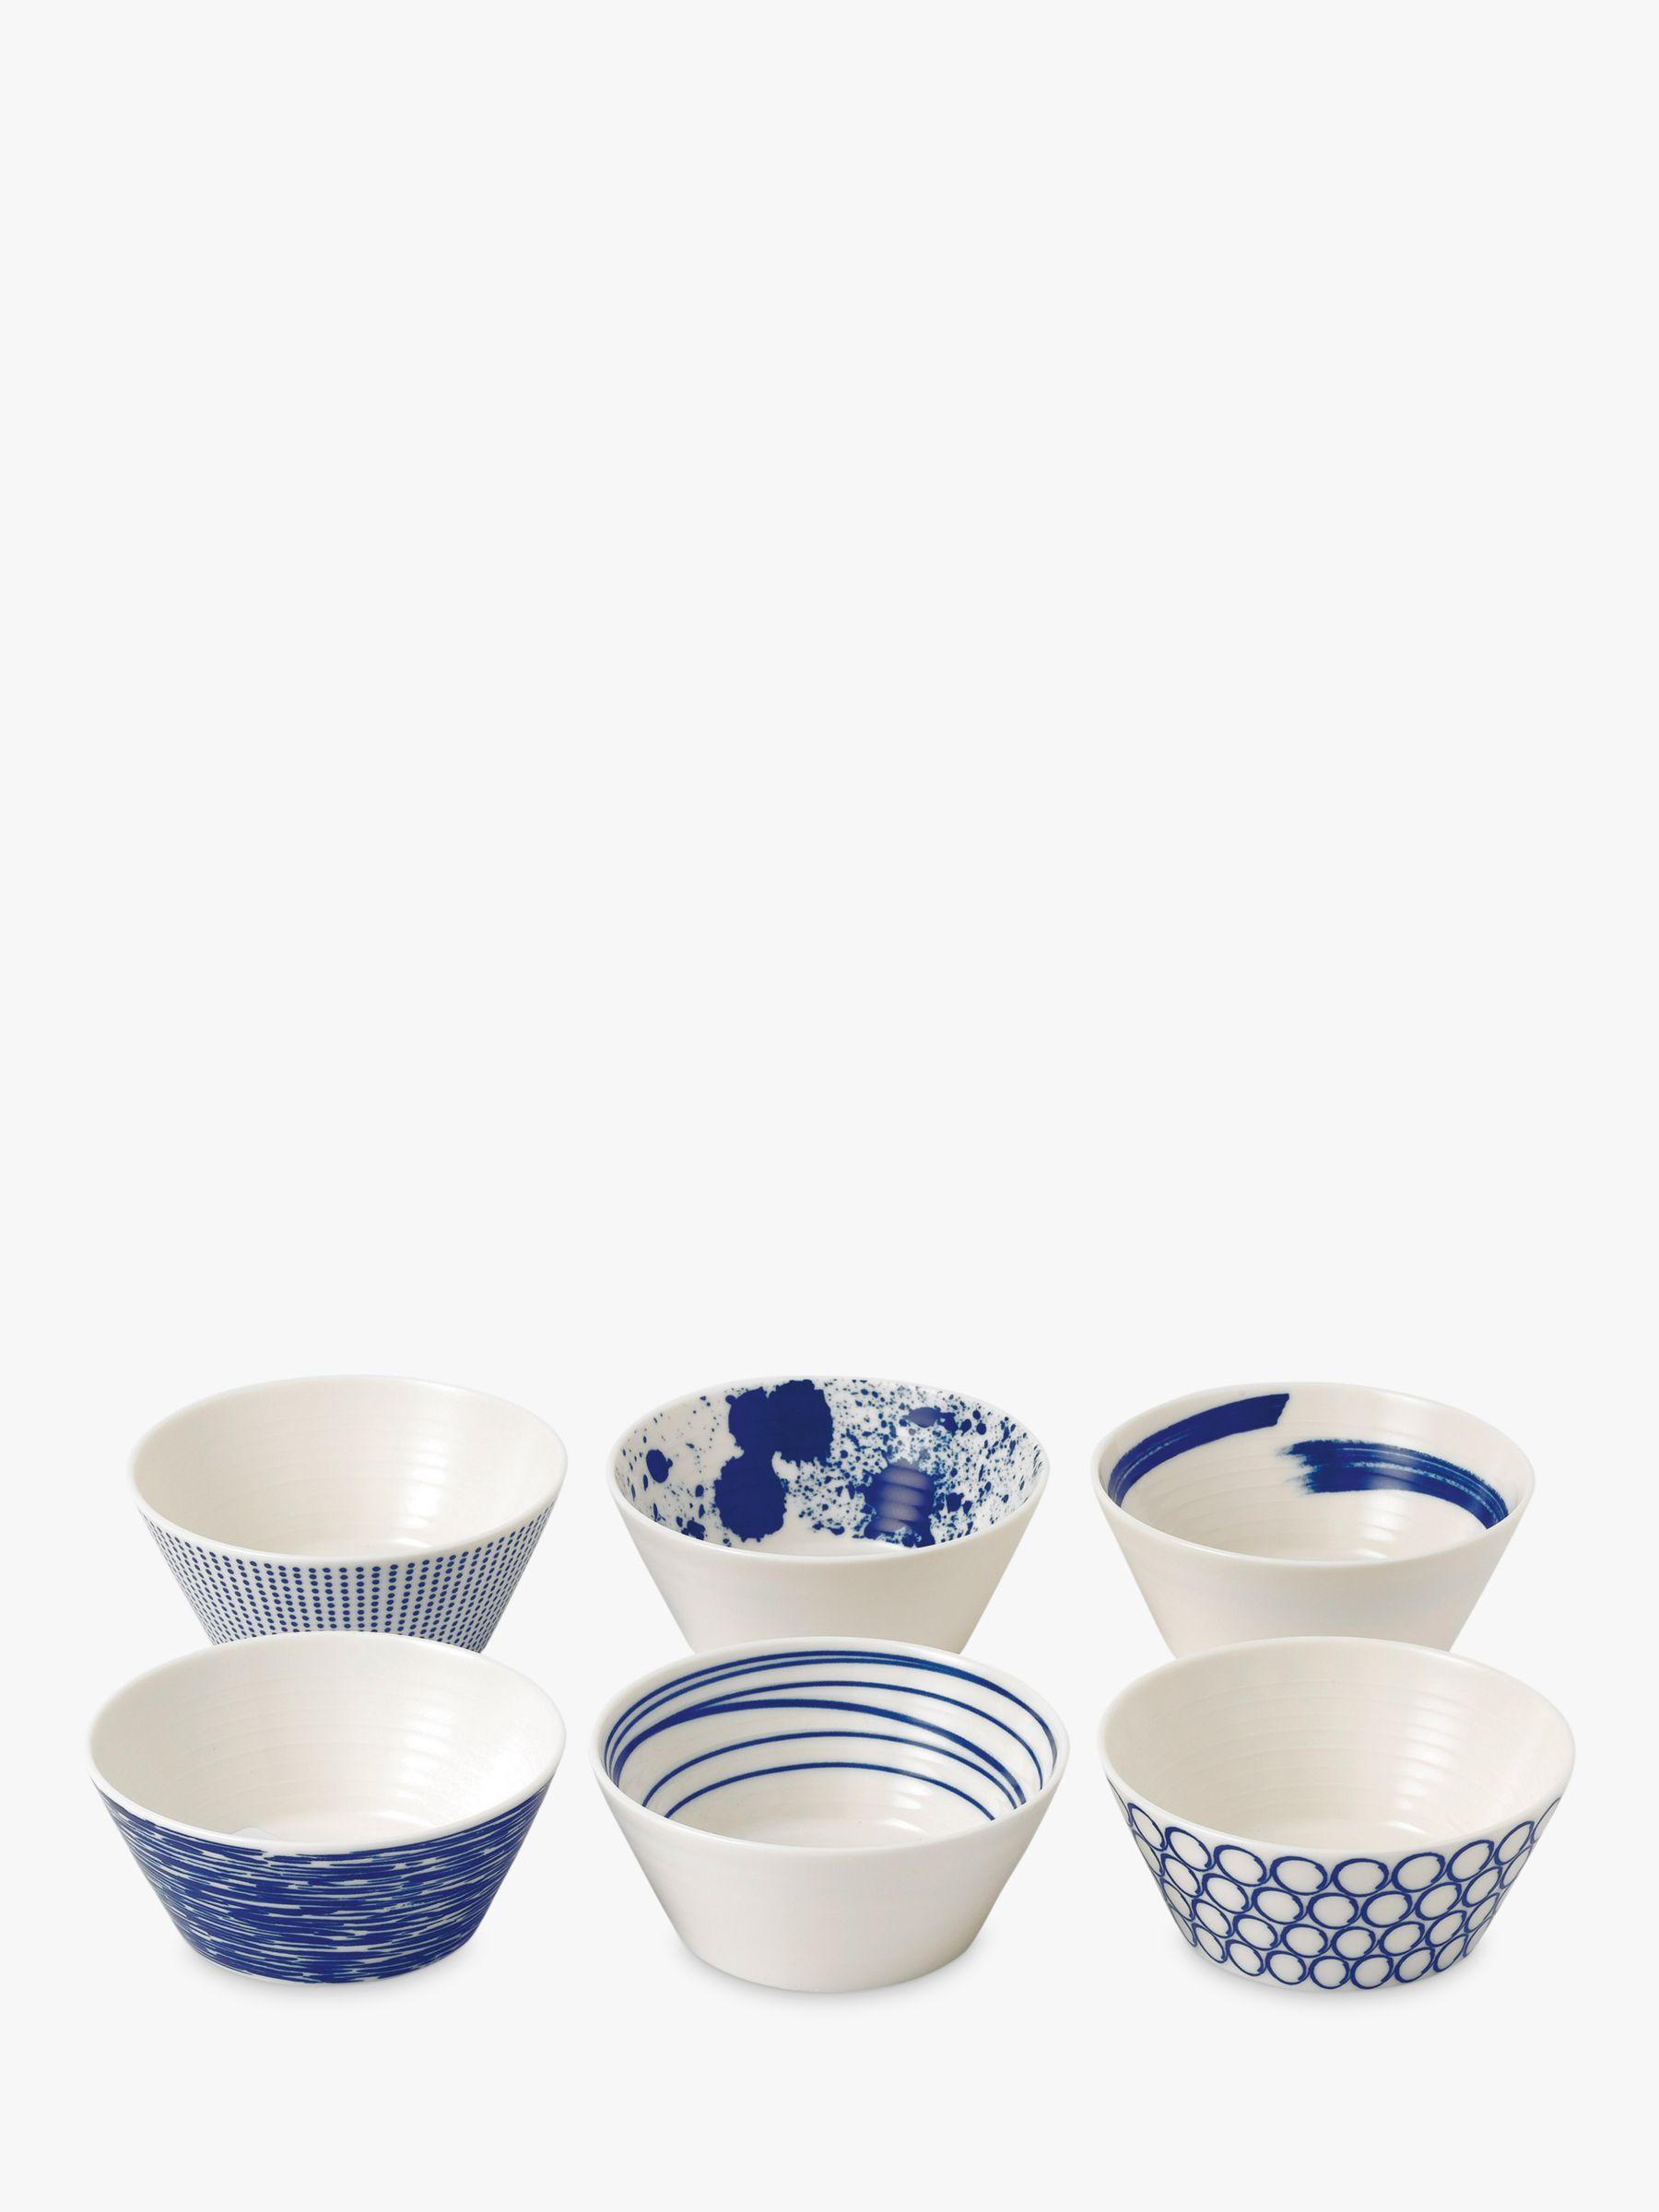 Royal Doulton Royal Doulton Pacific Porcelain Tapas Bowls, Set of 6, 11cm, Blue